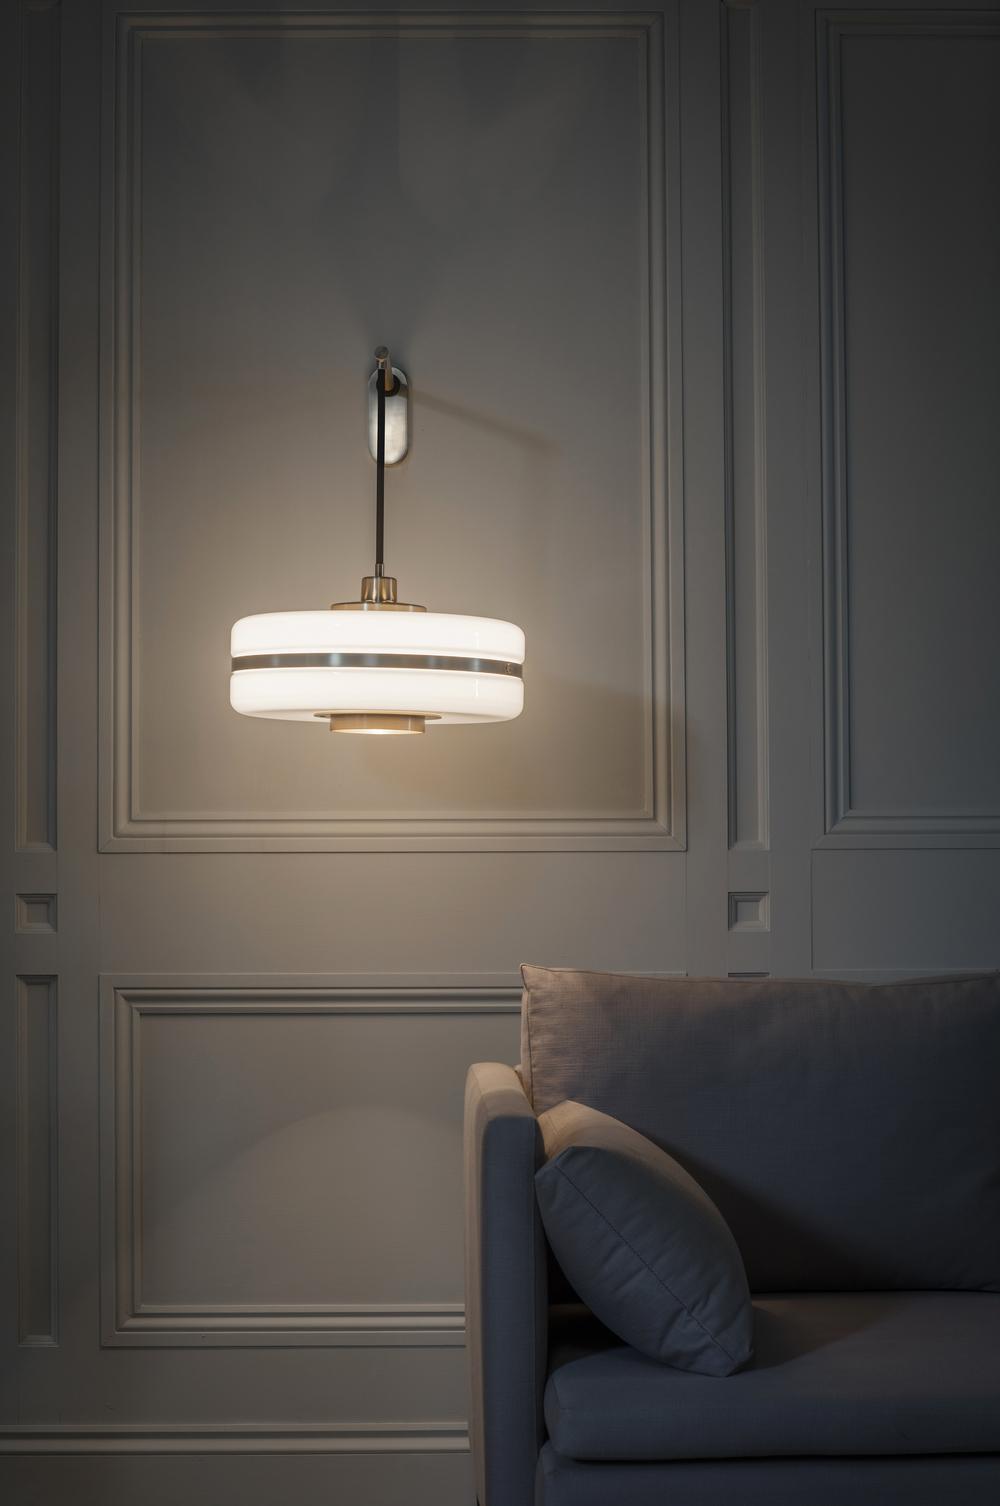 Masina wall light | Image courtesy of Bert Frank.